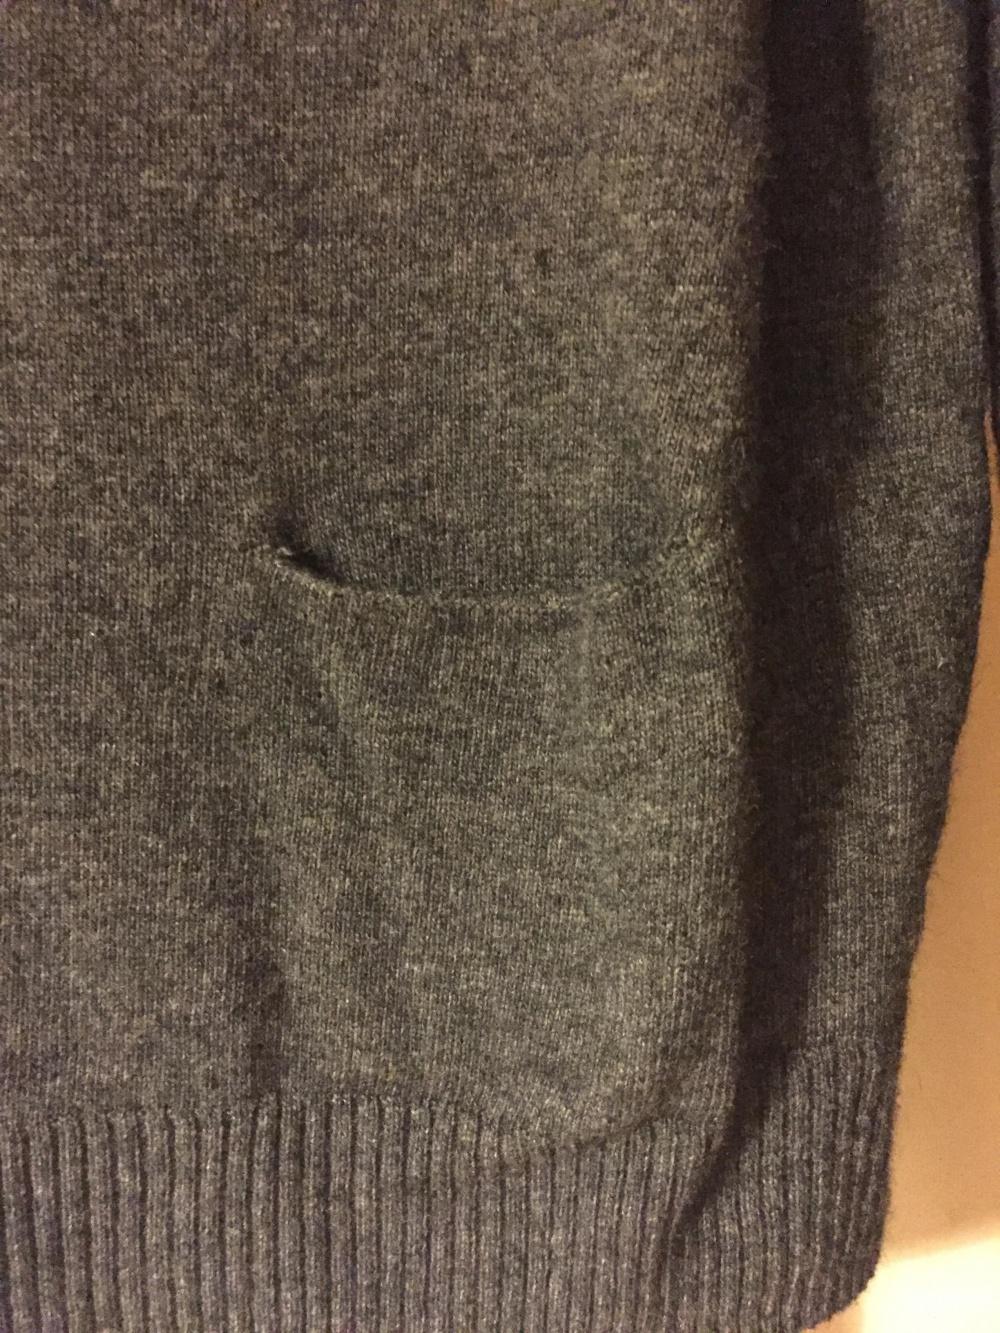 Свитер темно серый шведской марки Lindex на размер S-M.